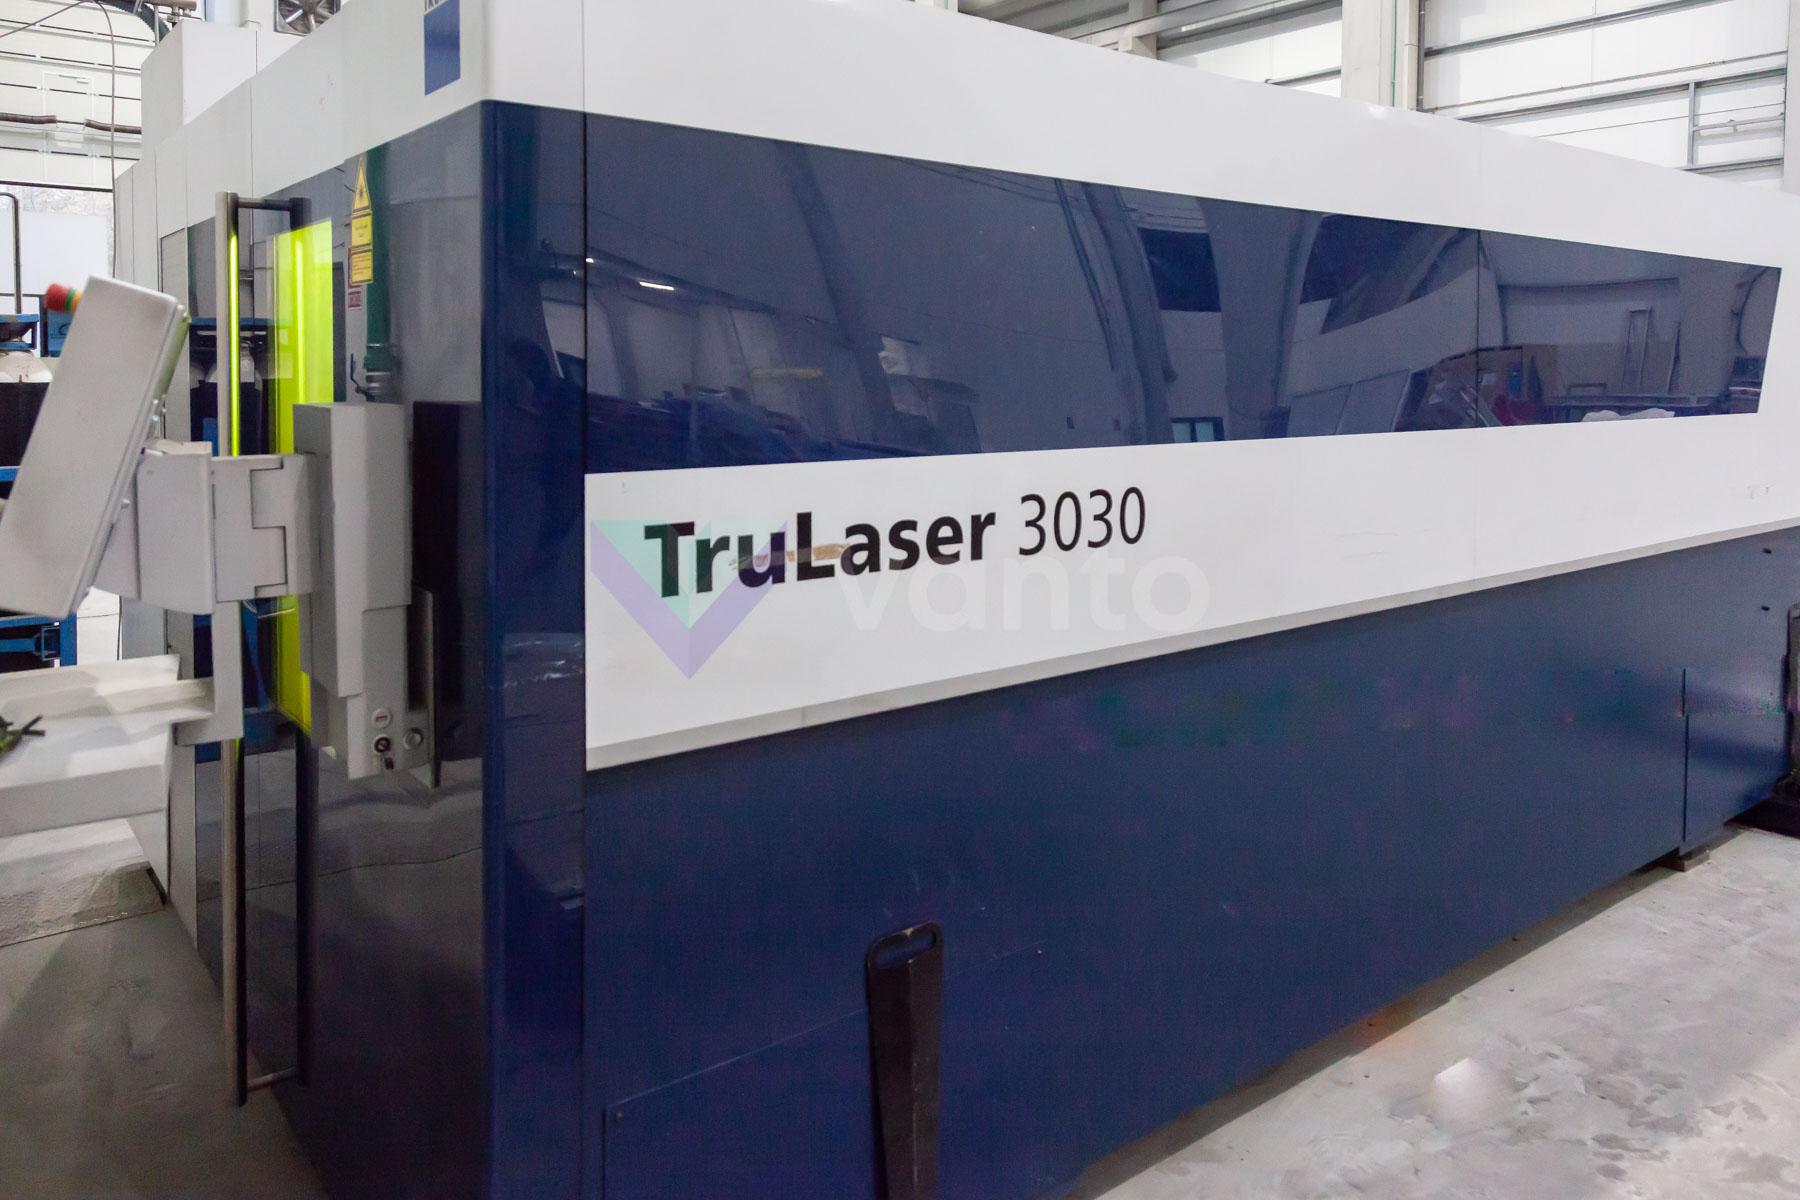 Máquina de corte láser (Fibra) TRUMPF TruLaser 3030 (2015) id10141